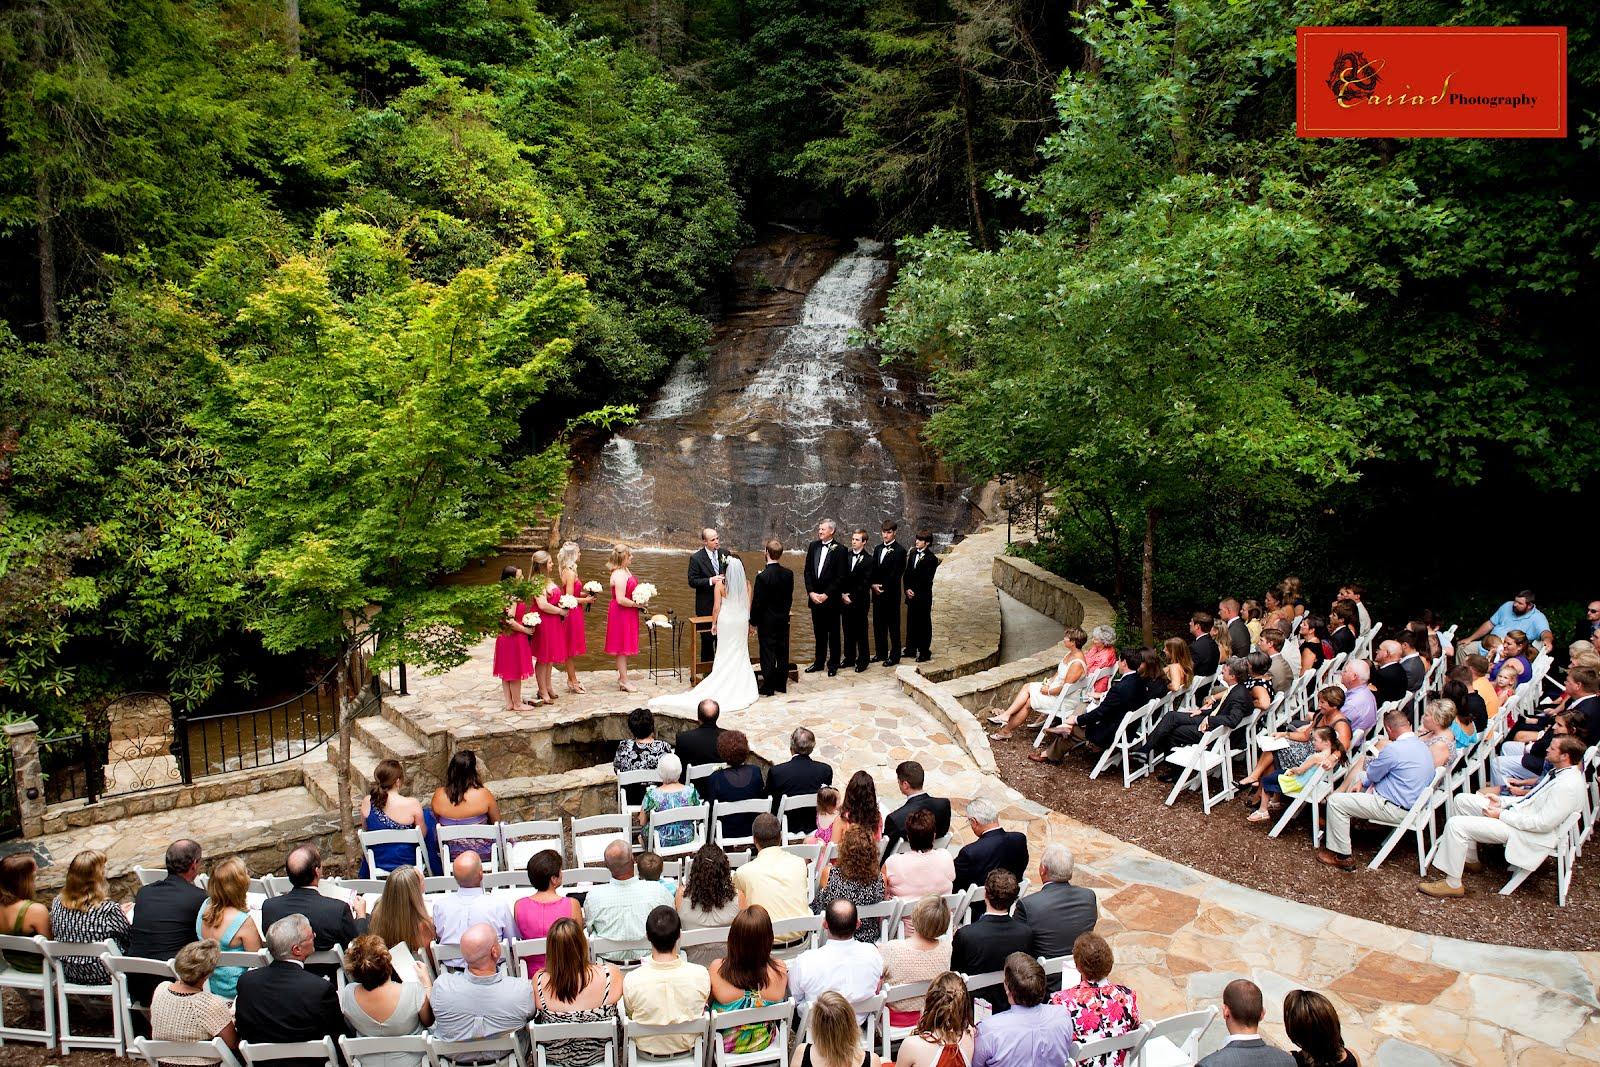 Cariad Photography Blog: Chota Falls Waterfall Wedding!